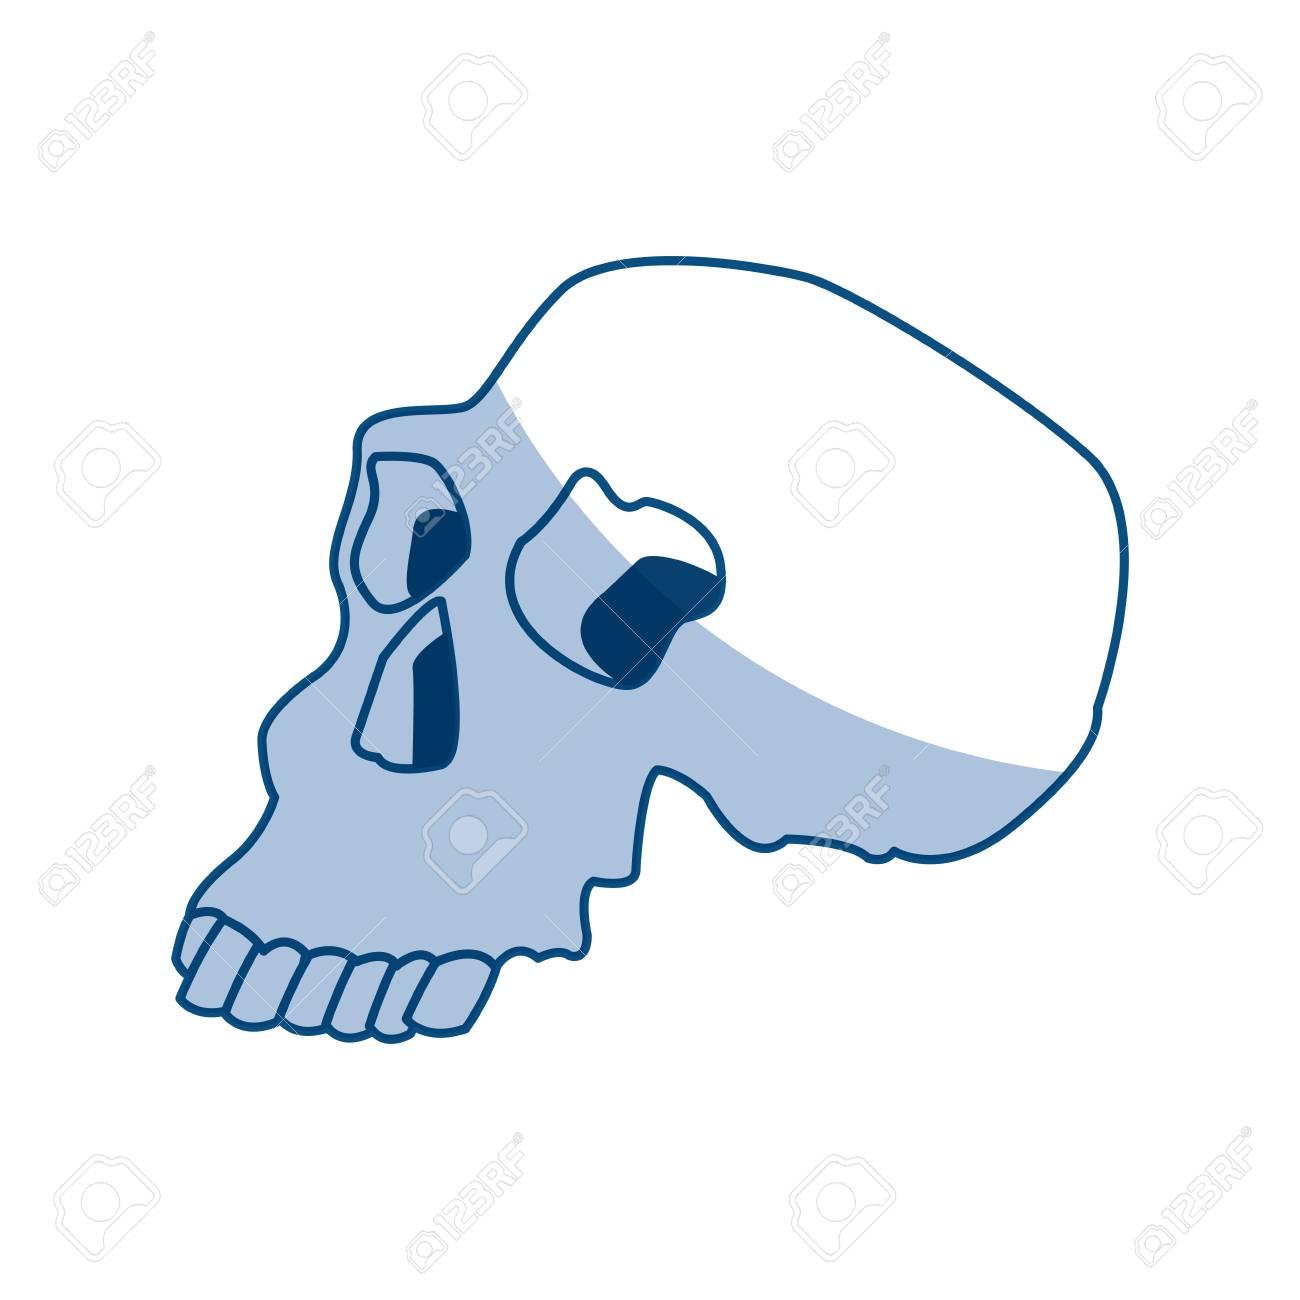 Skull Human Structure Anatomy Bone Icon Vector Illustration Royalty